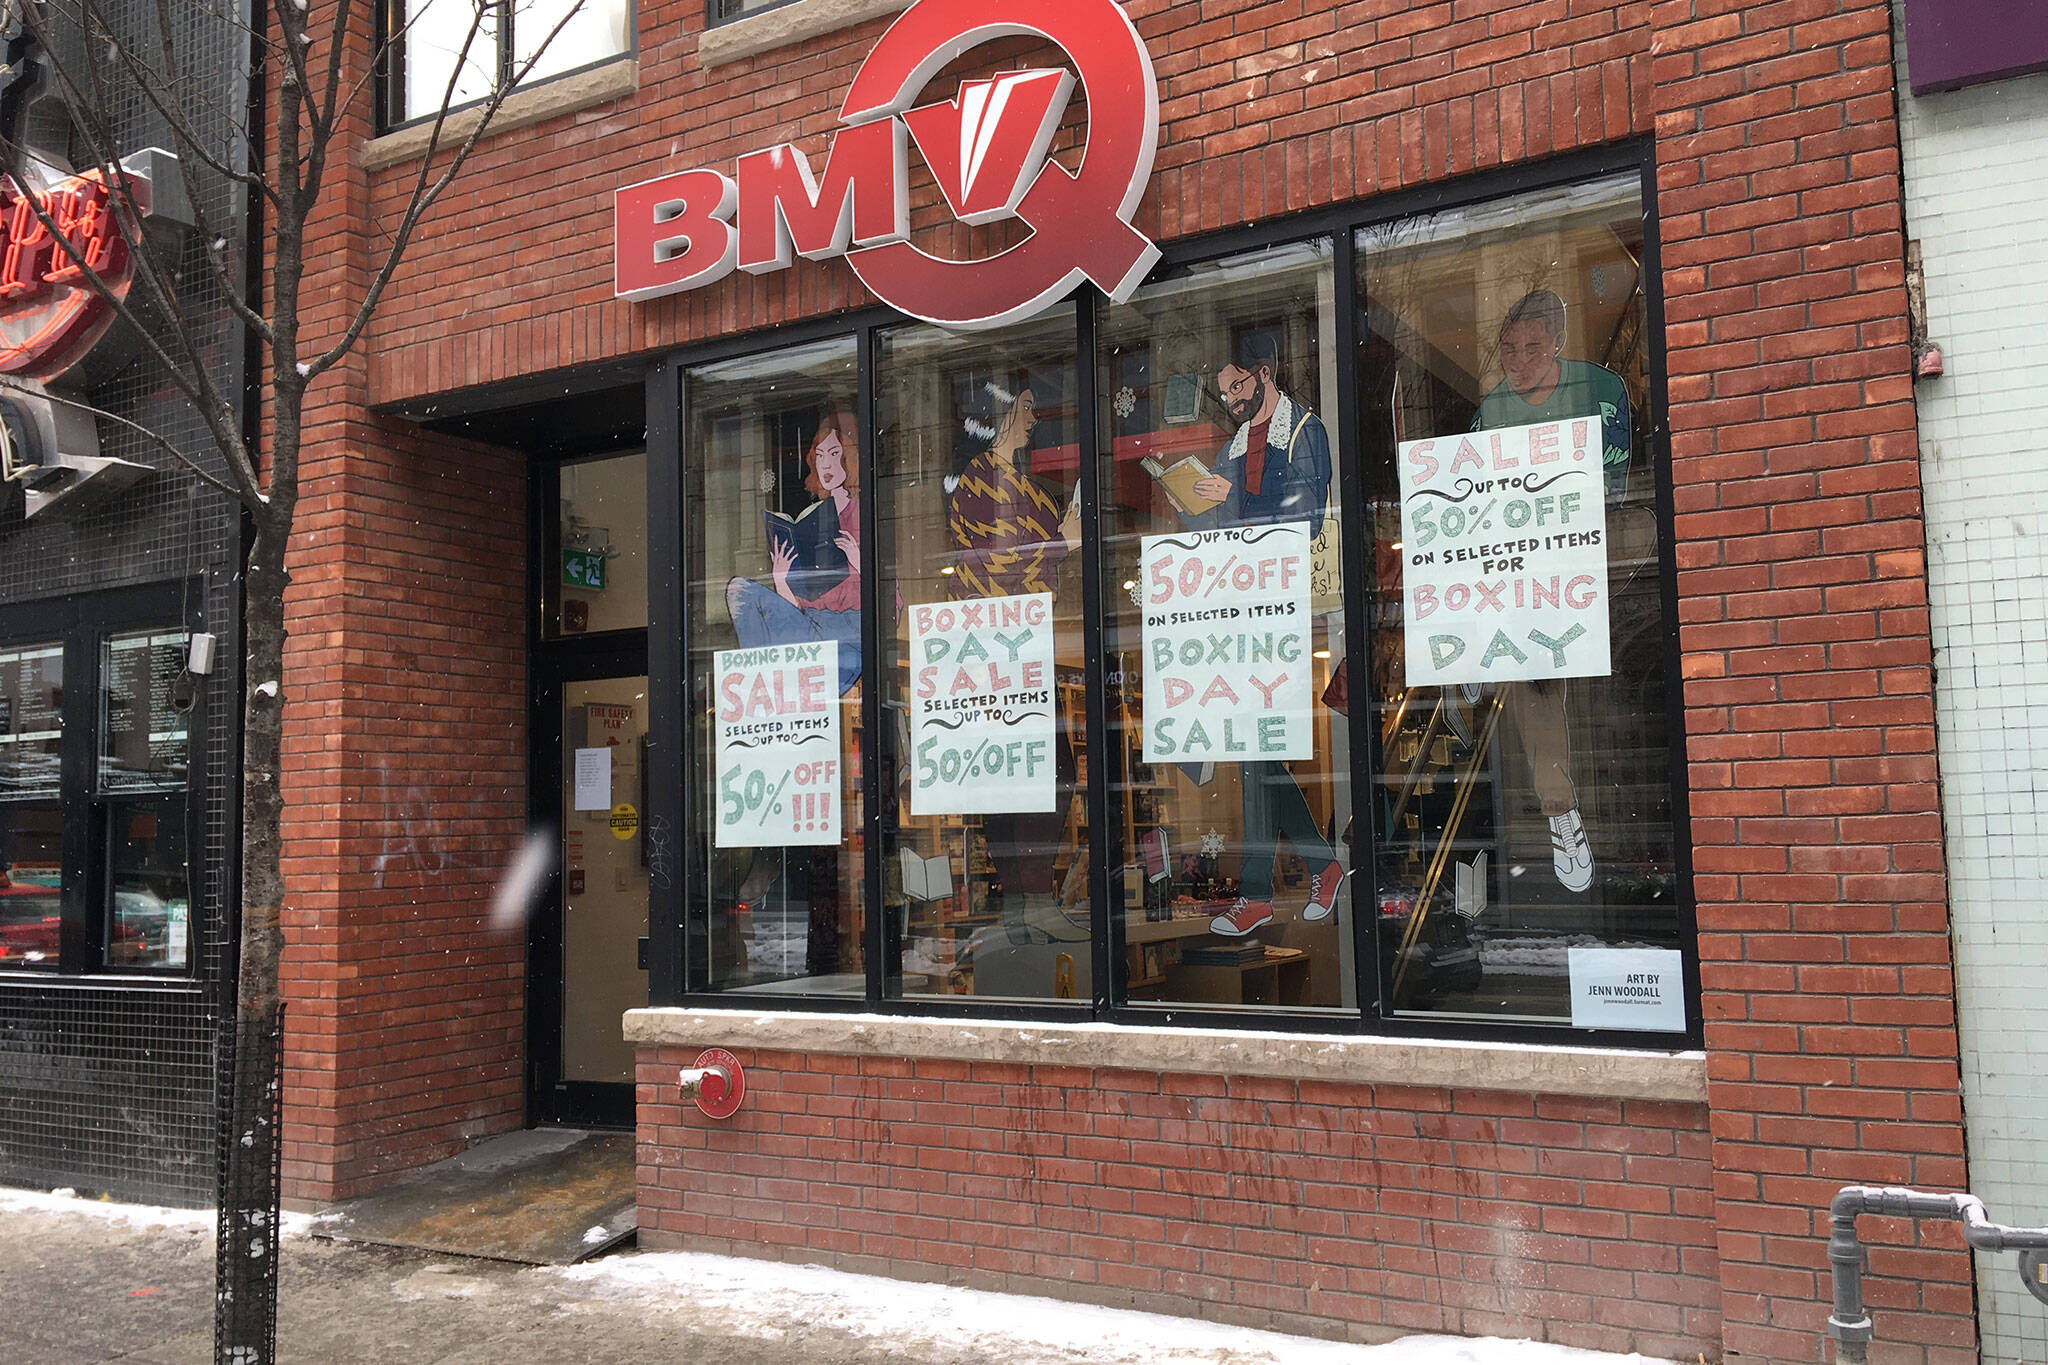 BMV Toronto